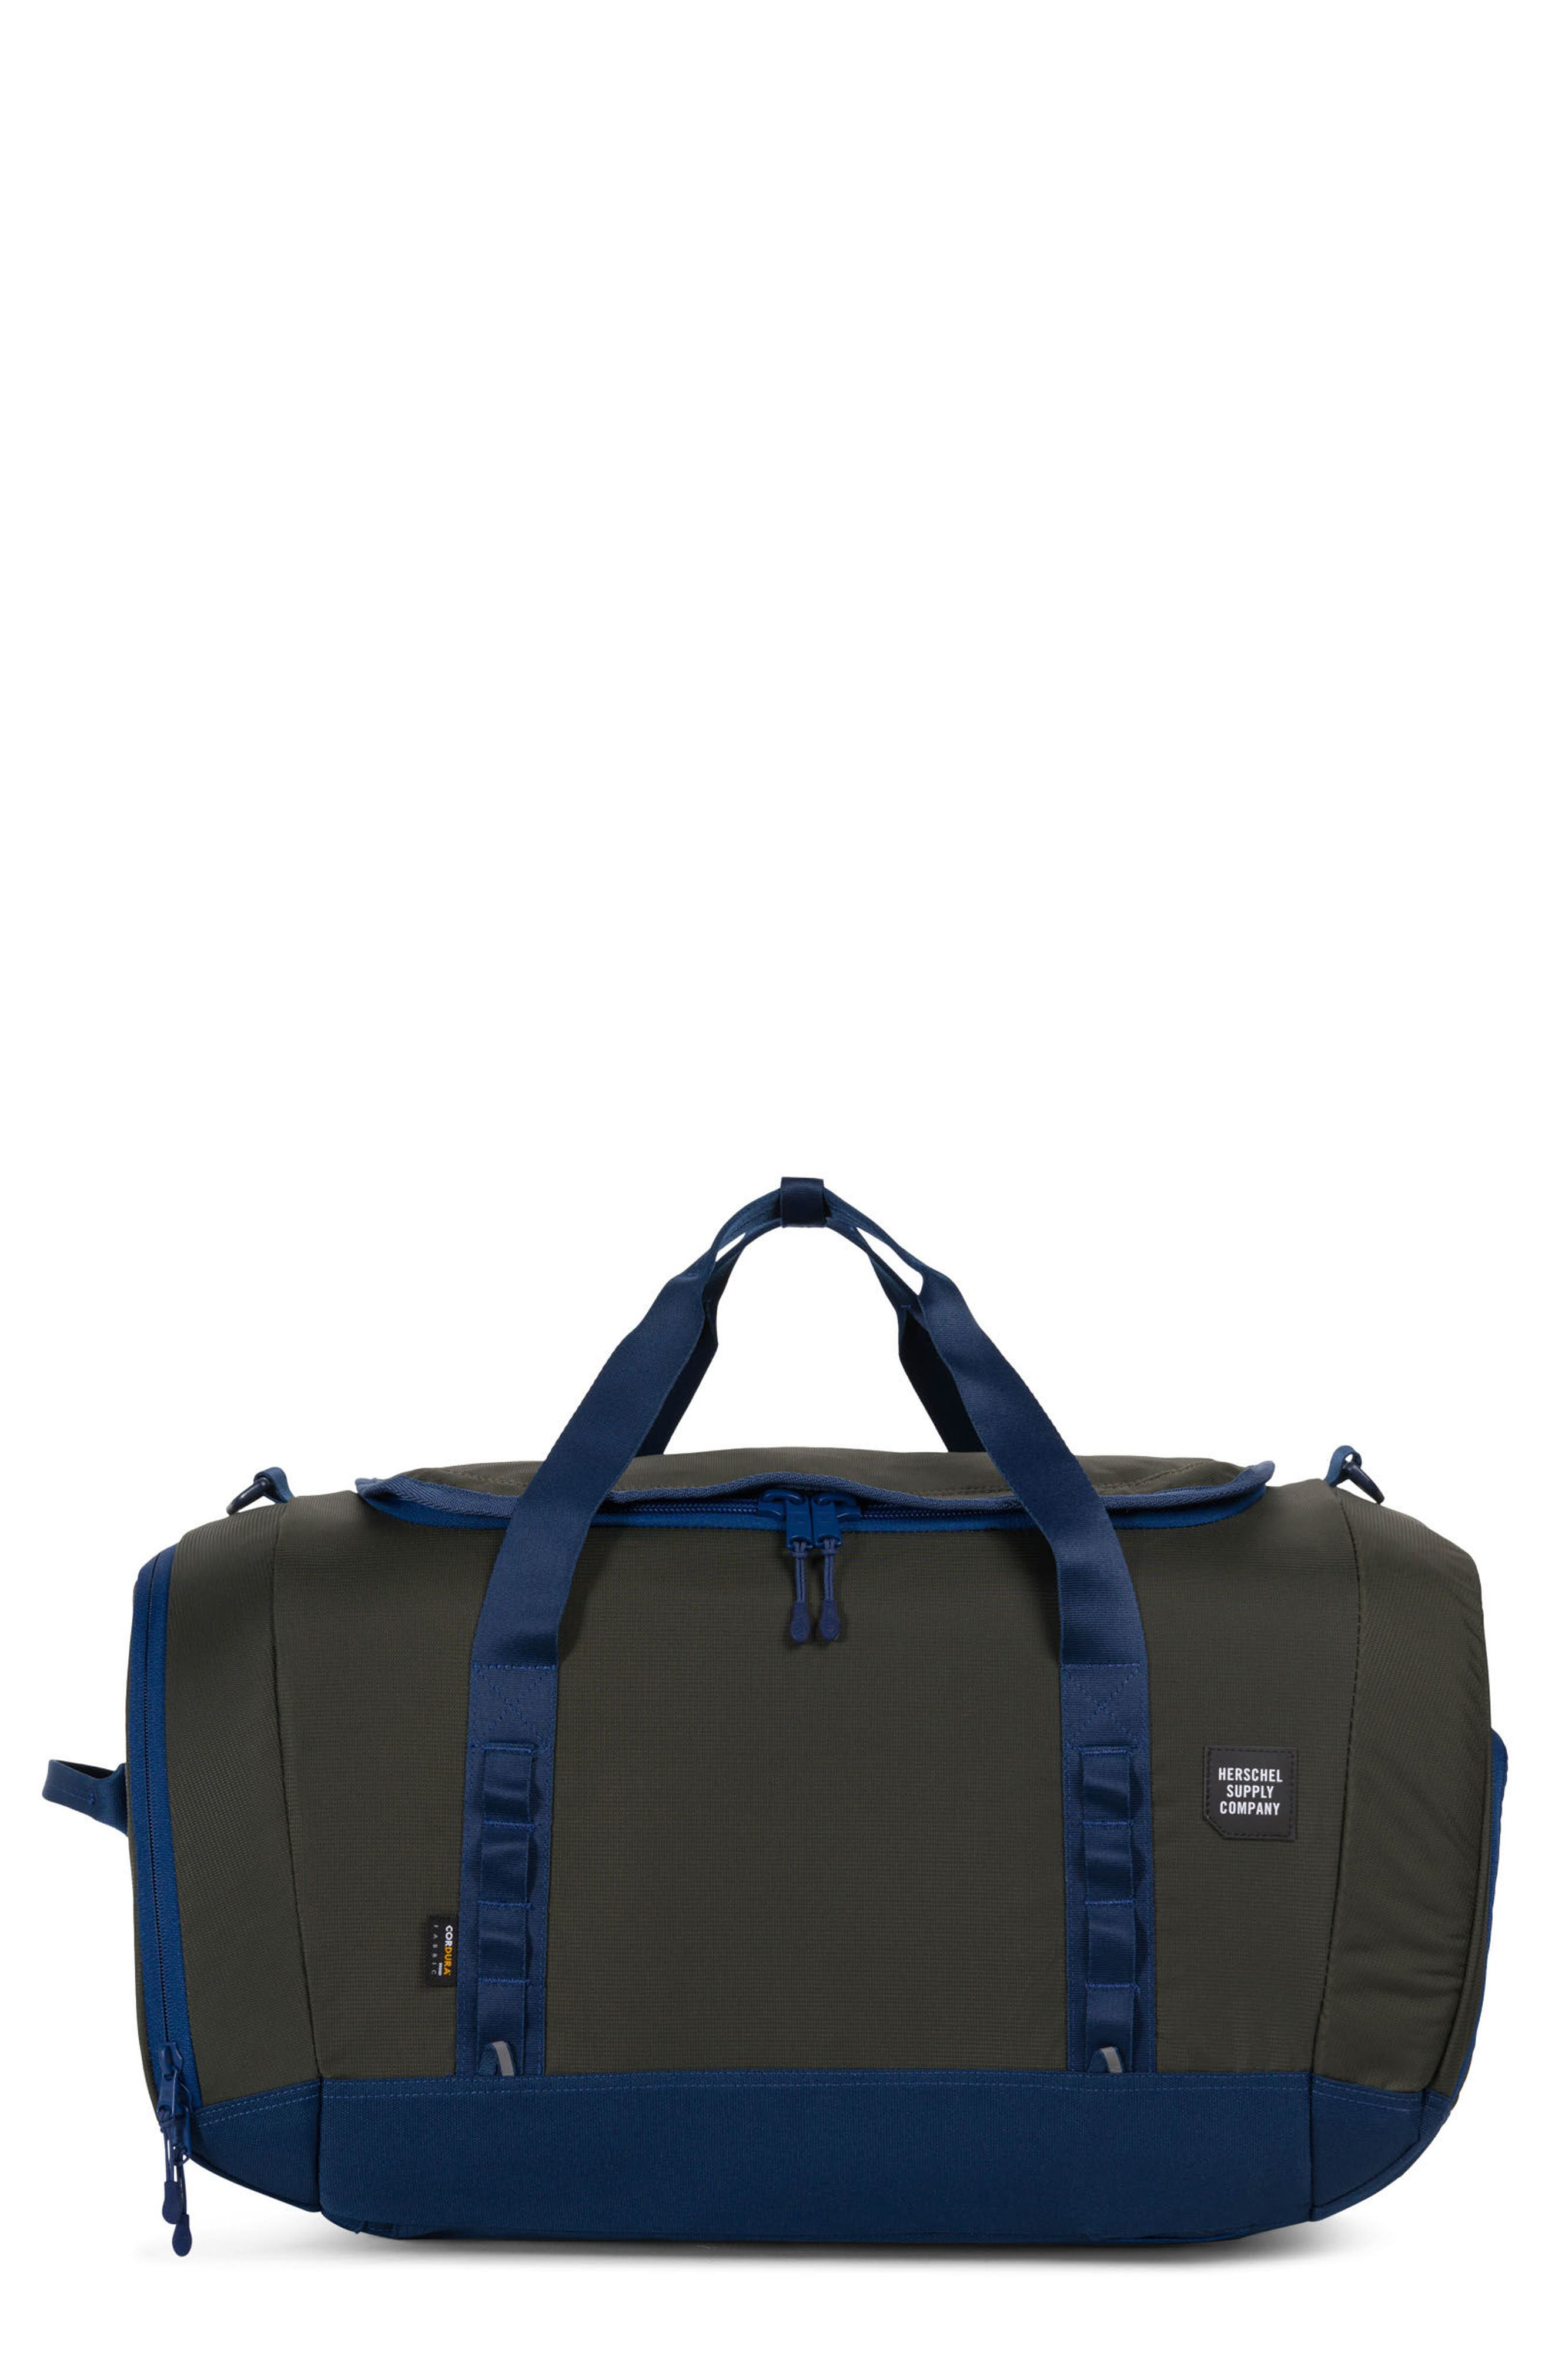 Main Image - Herschel Supply Co. Trail Gorge Duffel Bag